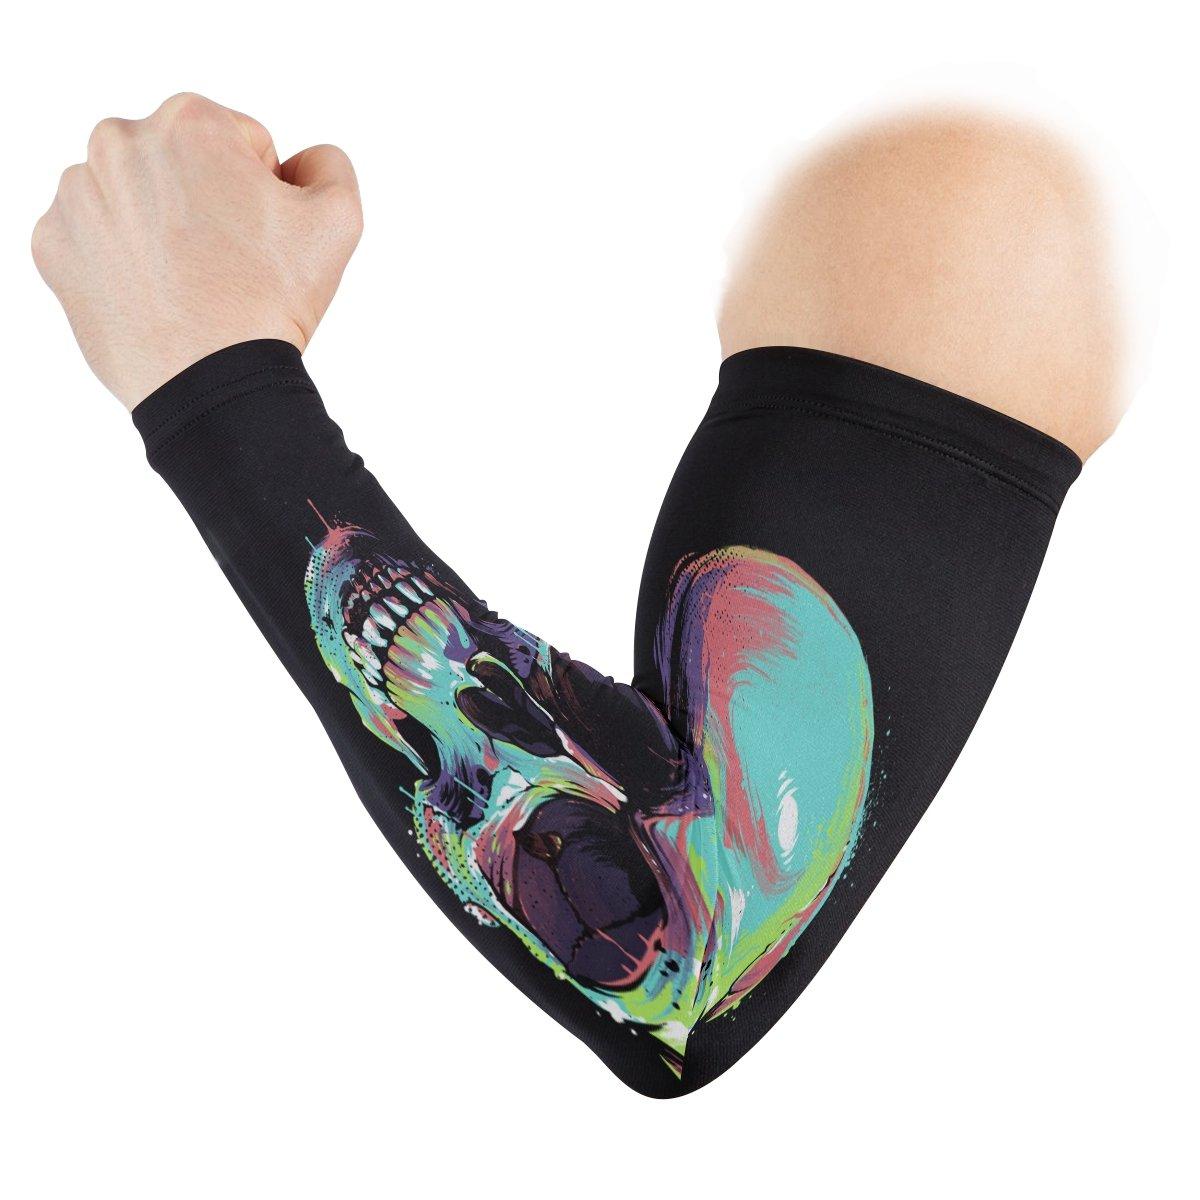 ZZKKO Skull - Mangas de refrigeración para brazo de hombre, protección solar para hombres, mujeres, running, golf, ciclismo, brazo calentador, ...